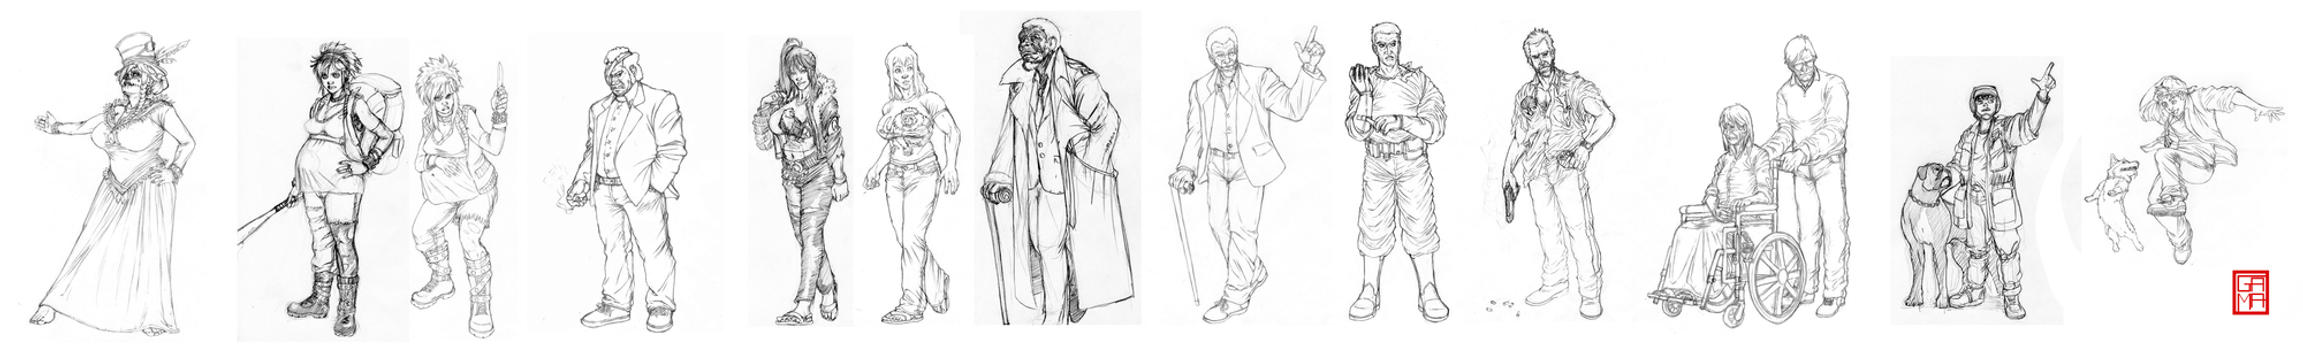 Apocalypse Tarot Characters by GaetanoMatruglio